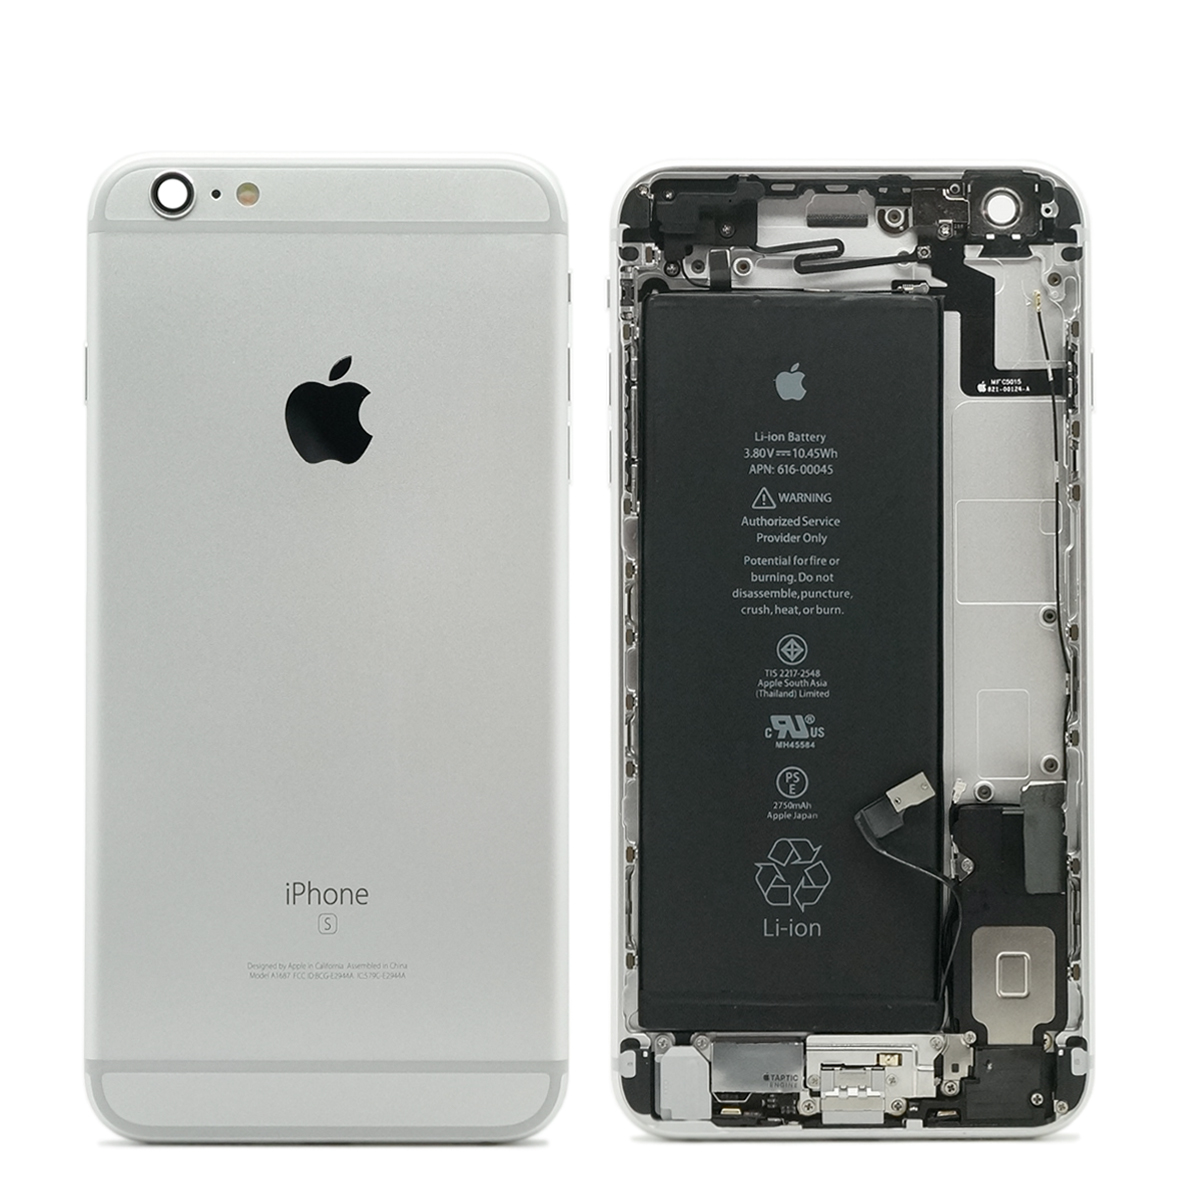 mint refurbished original apple iphone 6s plus housing. Black Bedroom Furniture Sets. Home Design Ideas